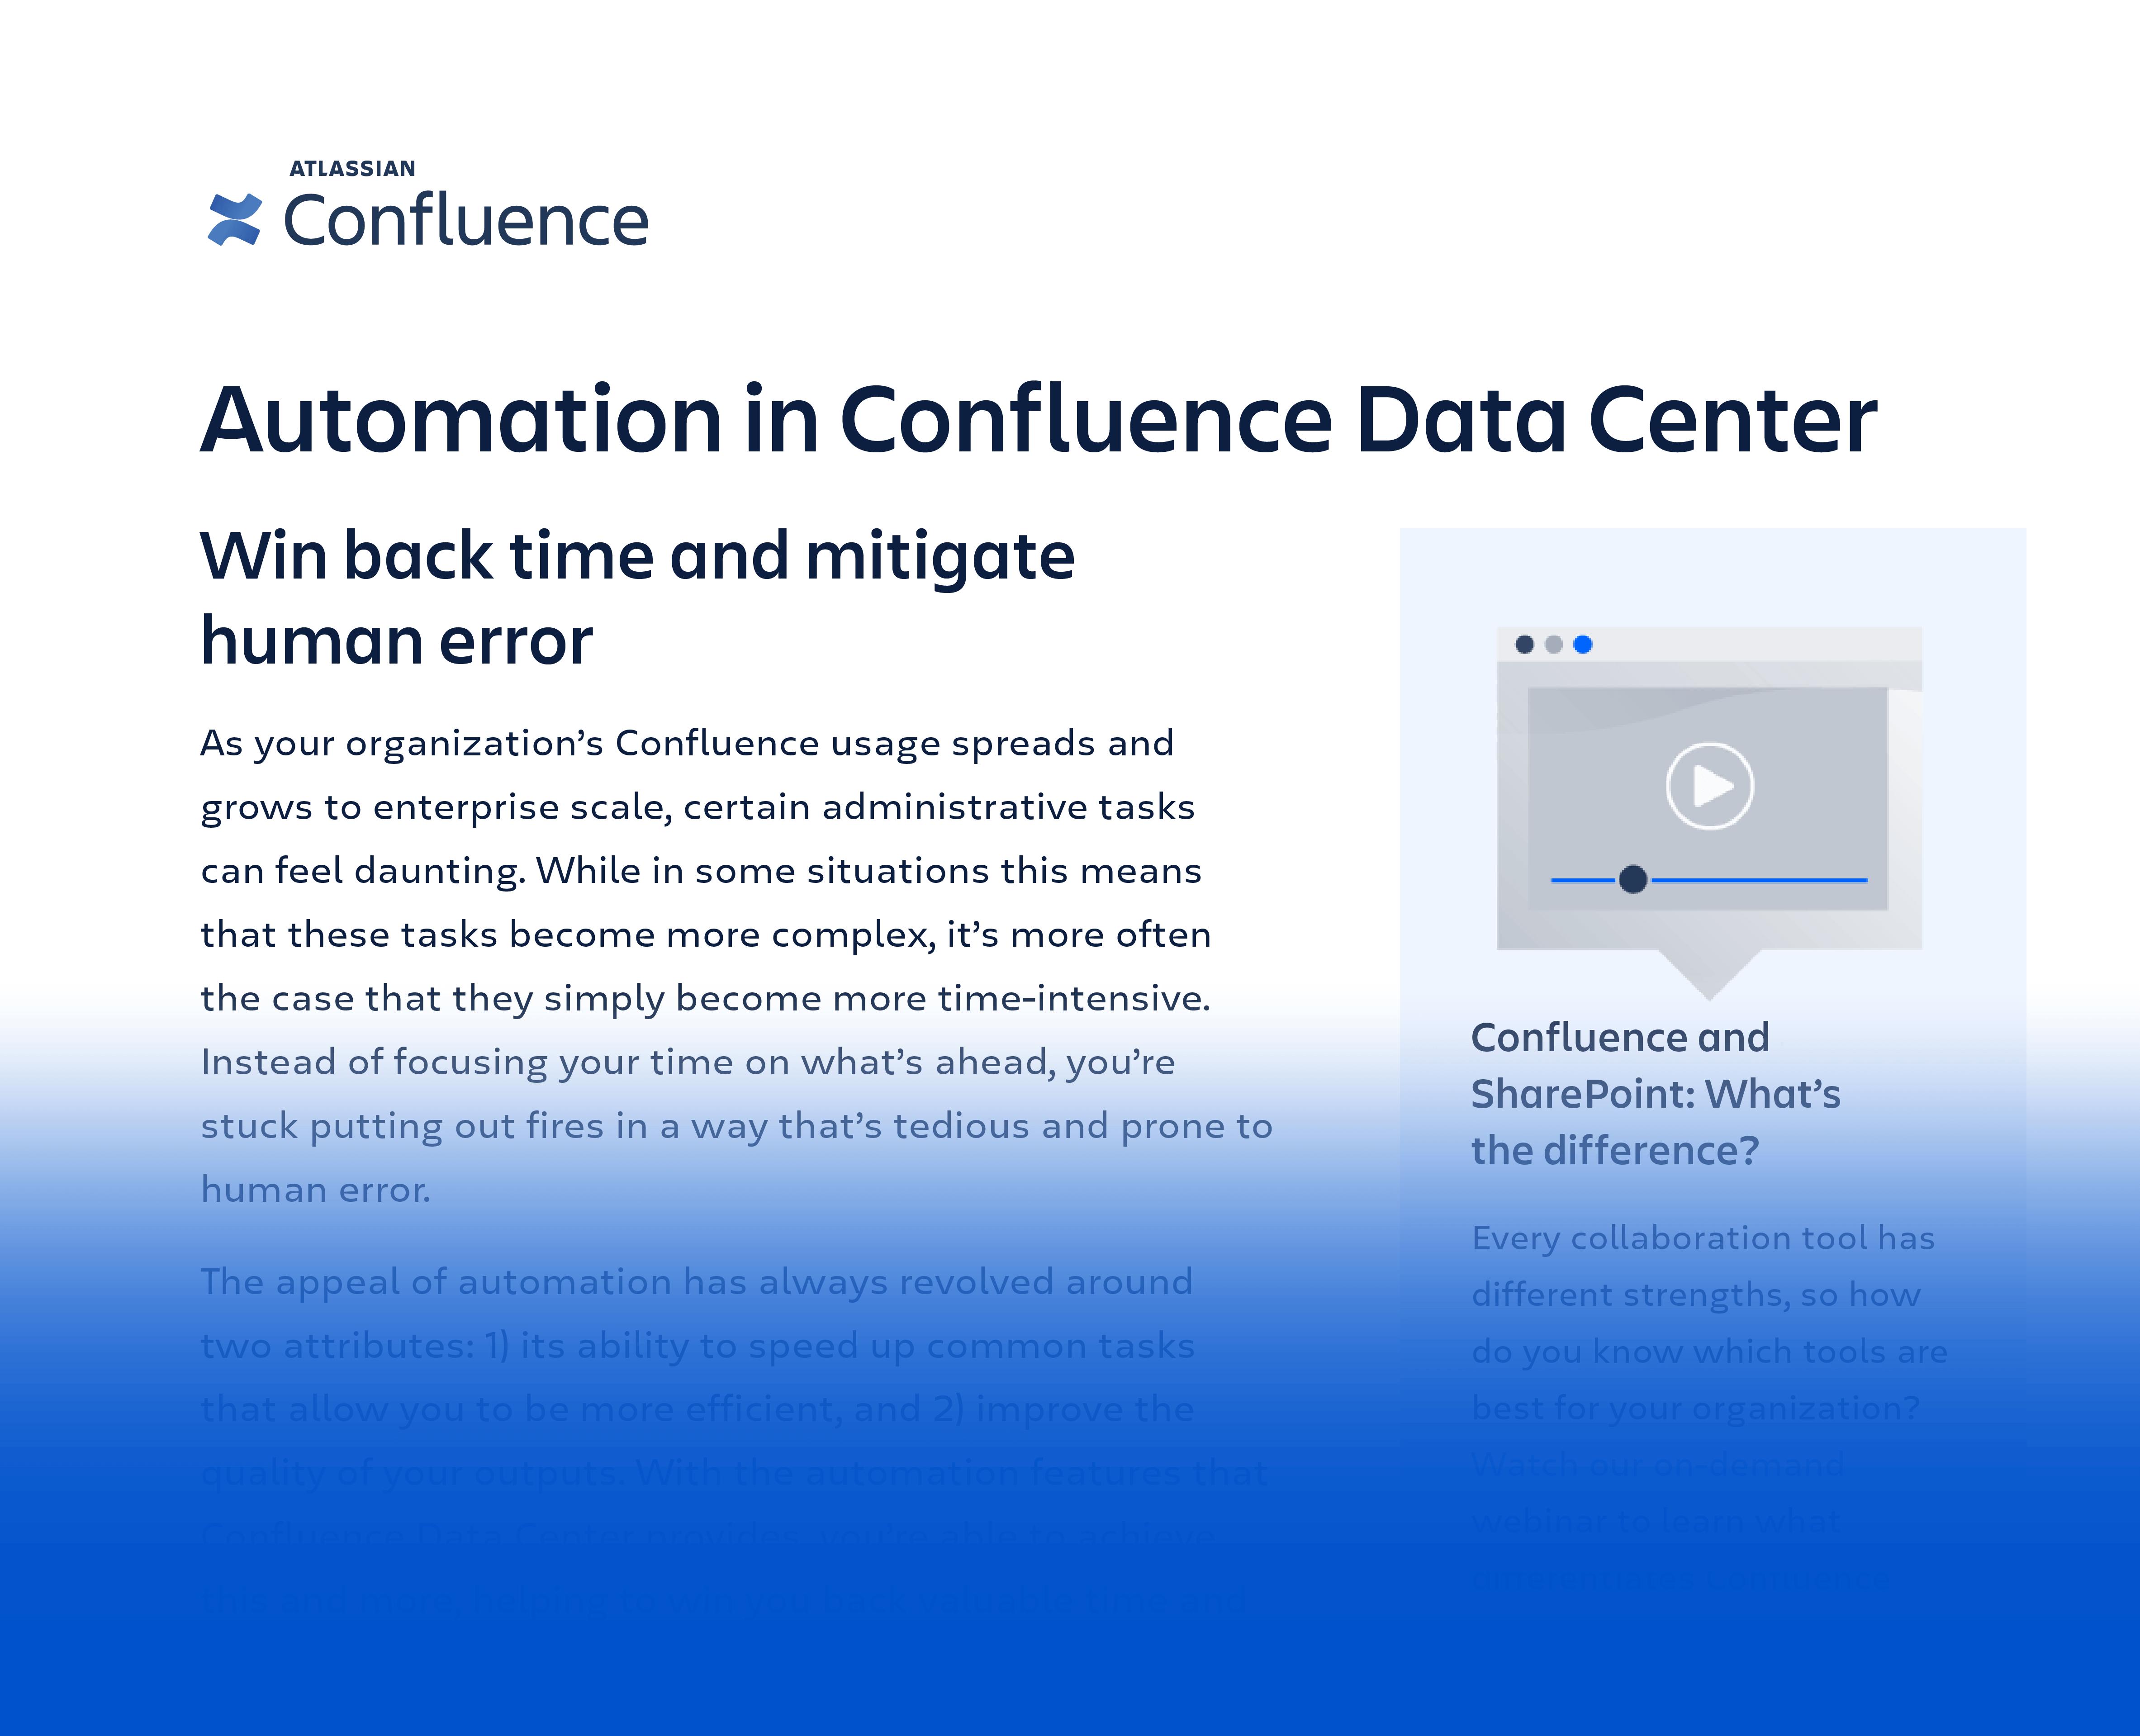 Datasheet: Automation in Confluence Data Center